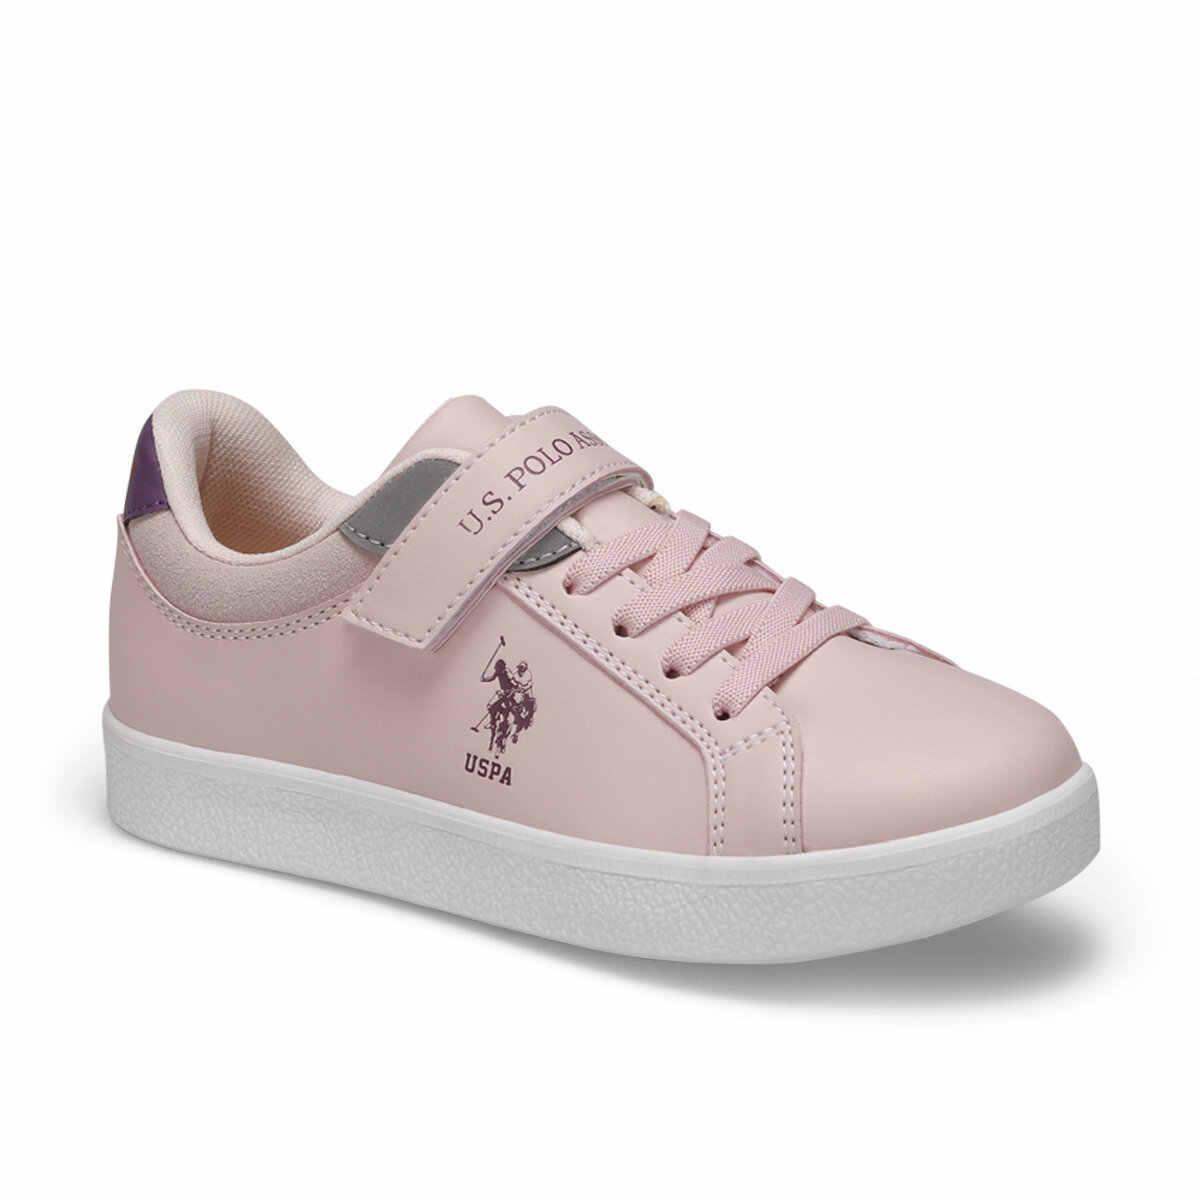 FLO ARNOLD Powder Female Child Sneaker